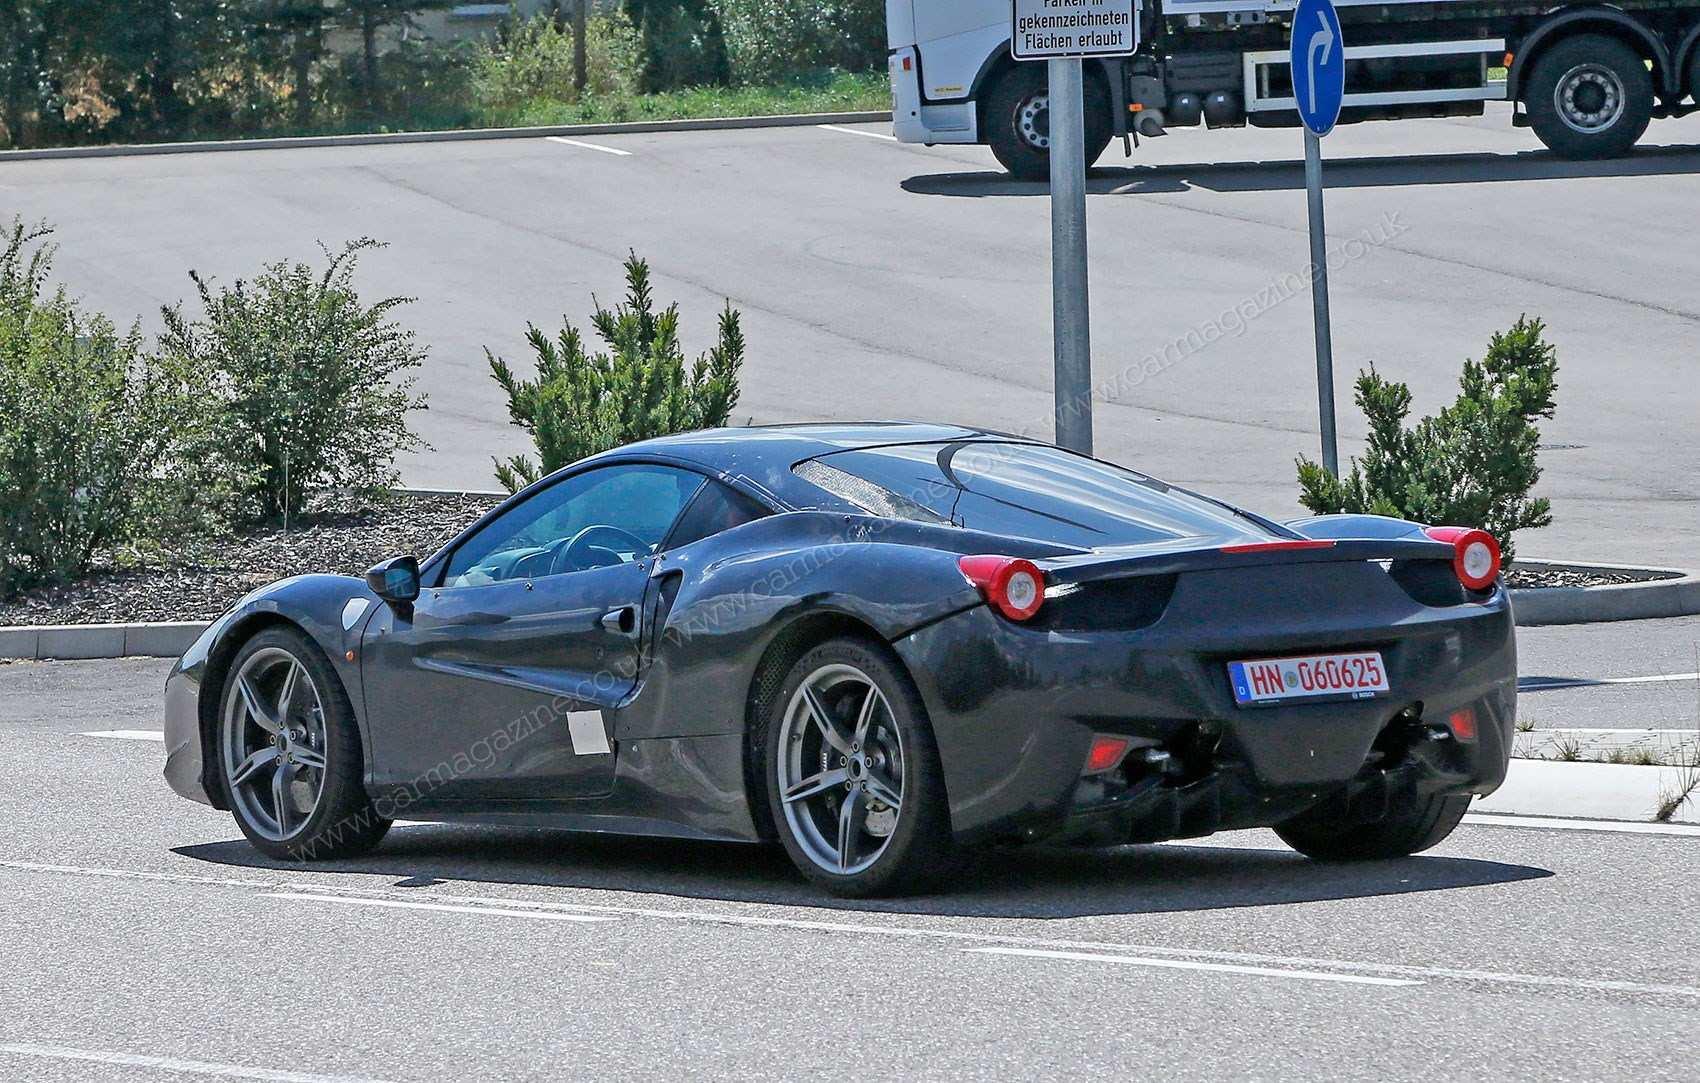 83 Concept of Ferrari V6 2019 Research New with Ferrari V6 2019